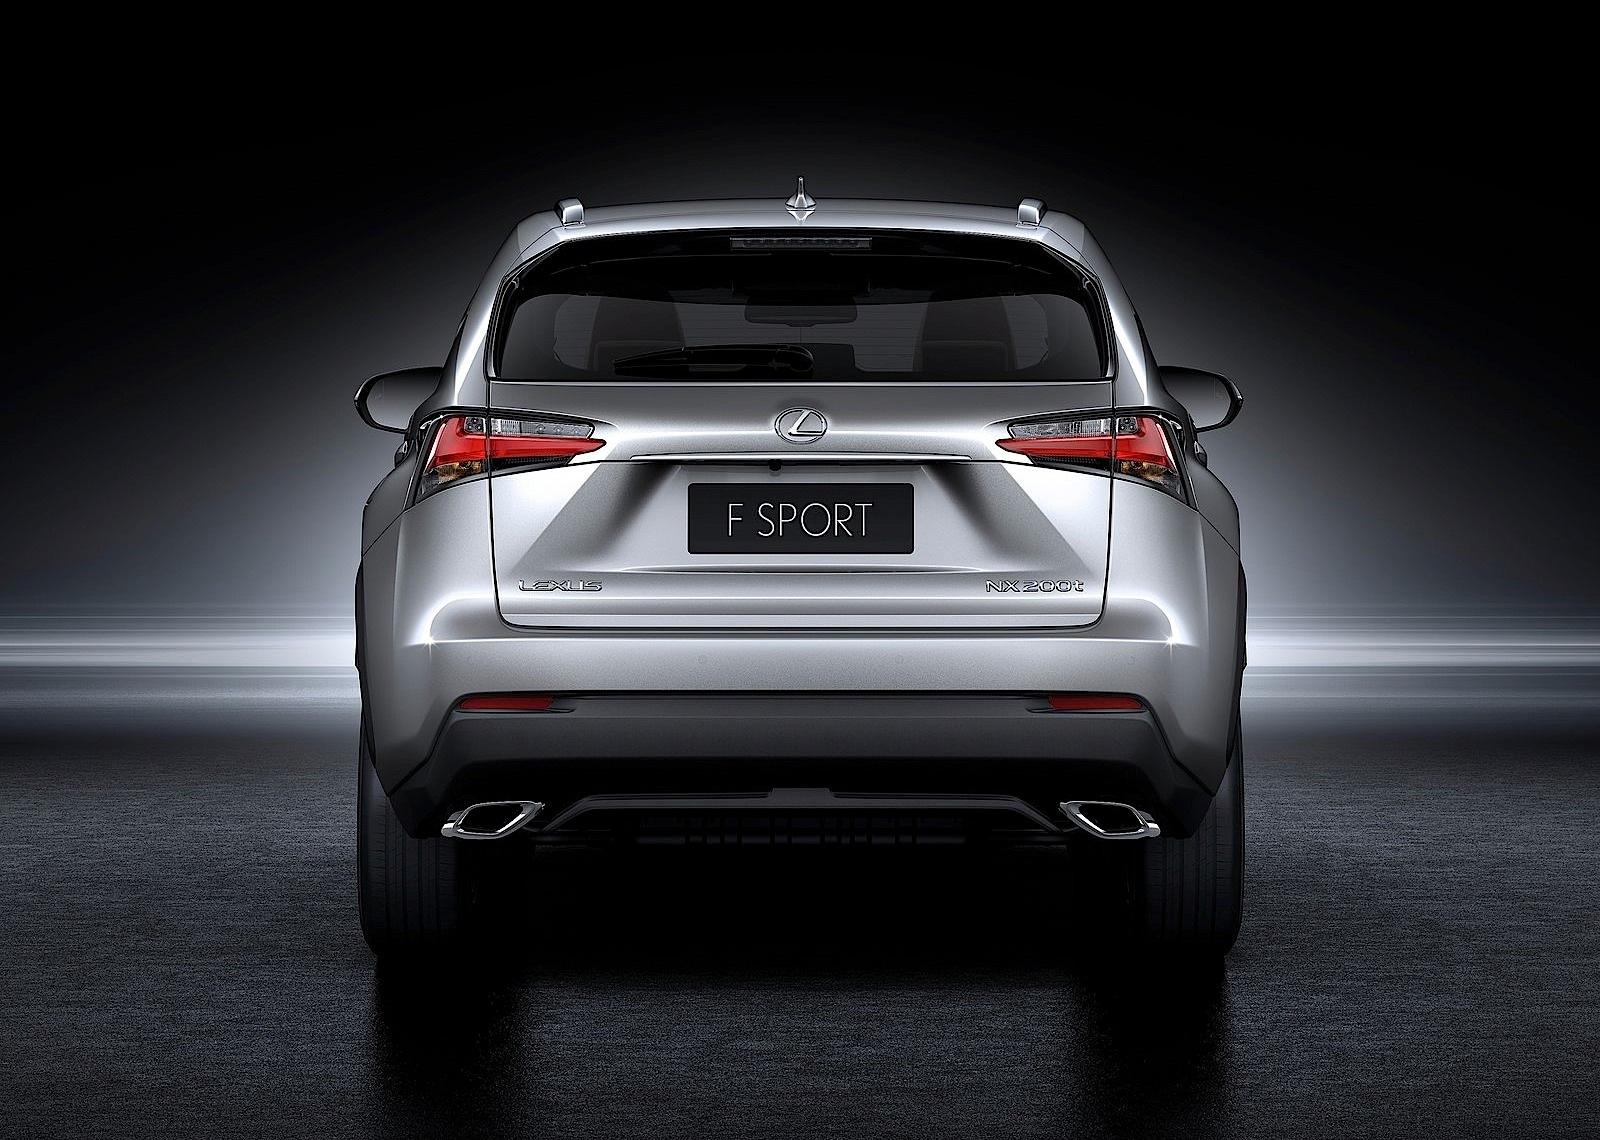 2014 Lexus Is350 F Sport Specs >> LEXUS NX specs & photos - 2014, 2015, 2016, 2017 - autoevolution